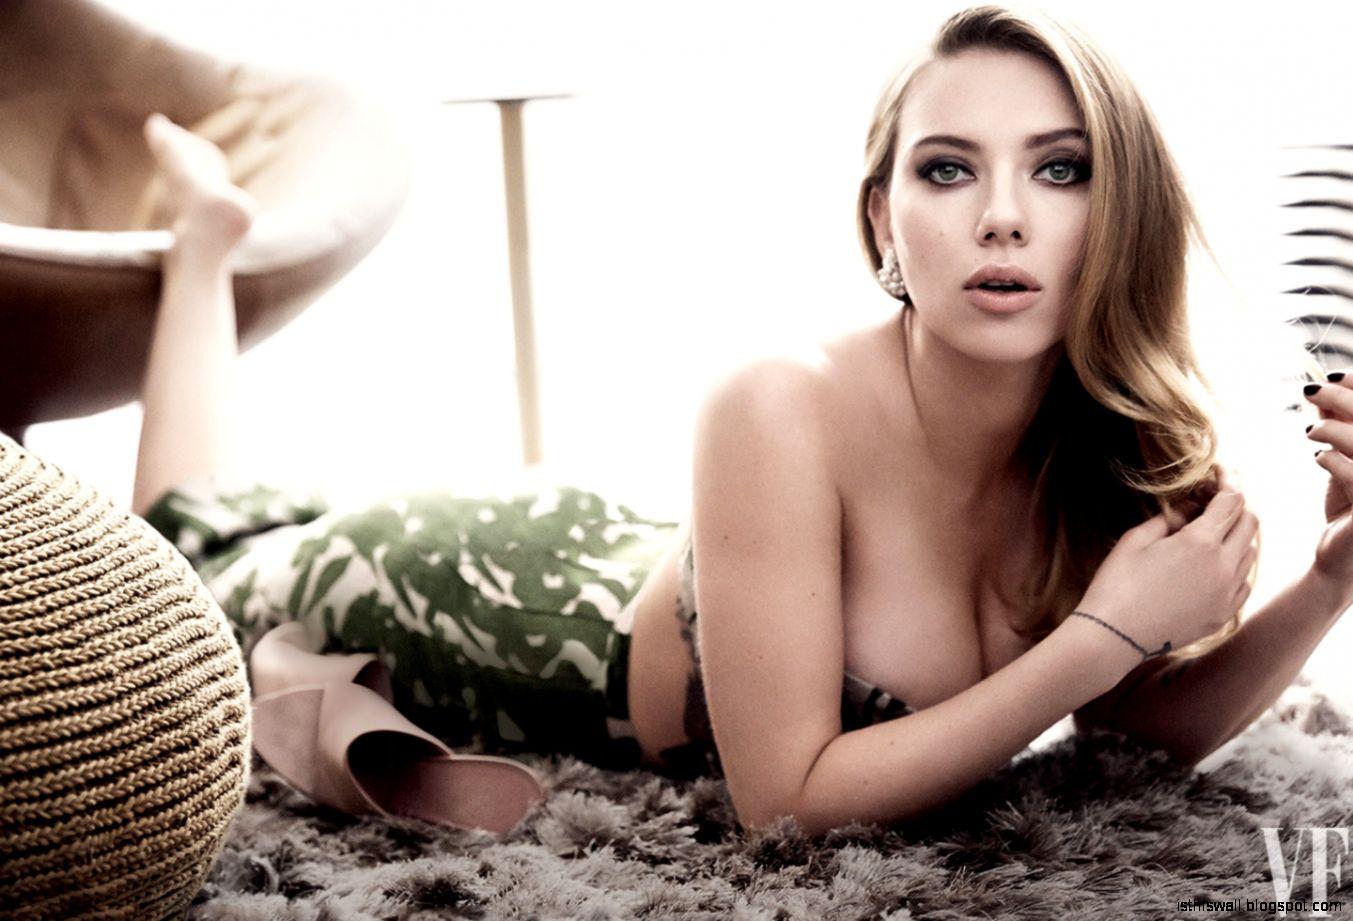 Scarlett Johansson Height and Weight Stats